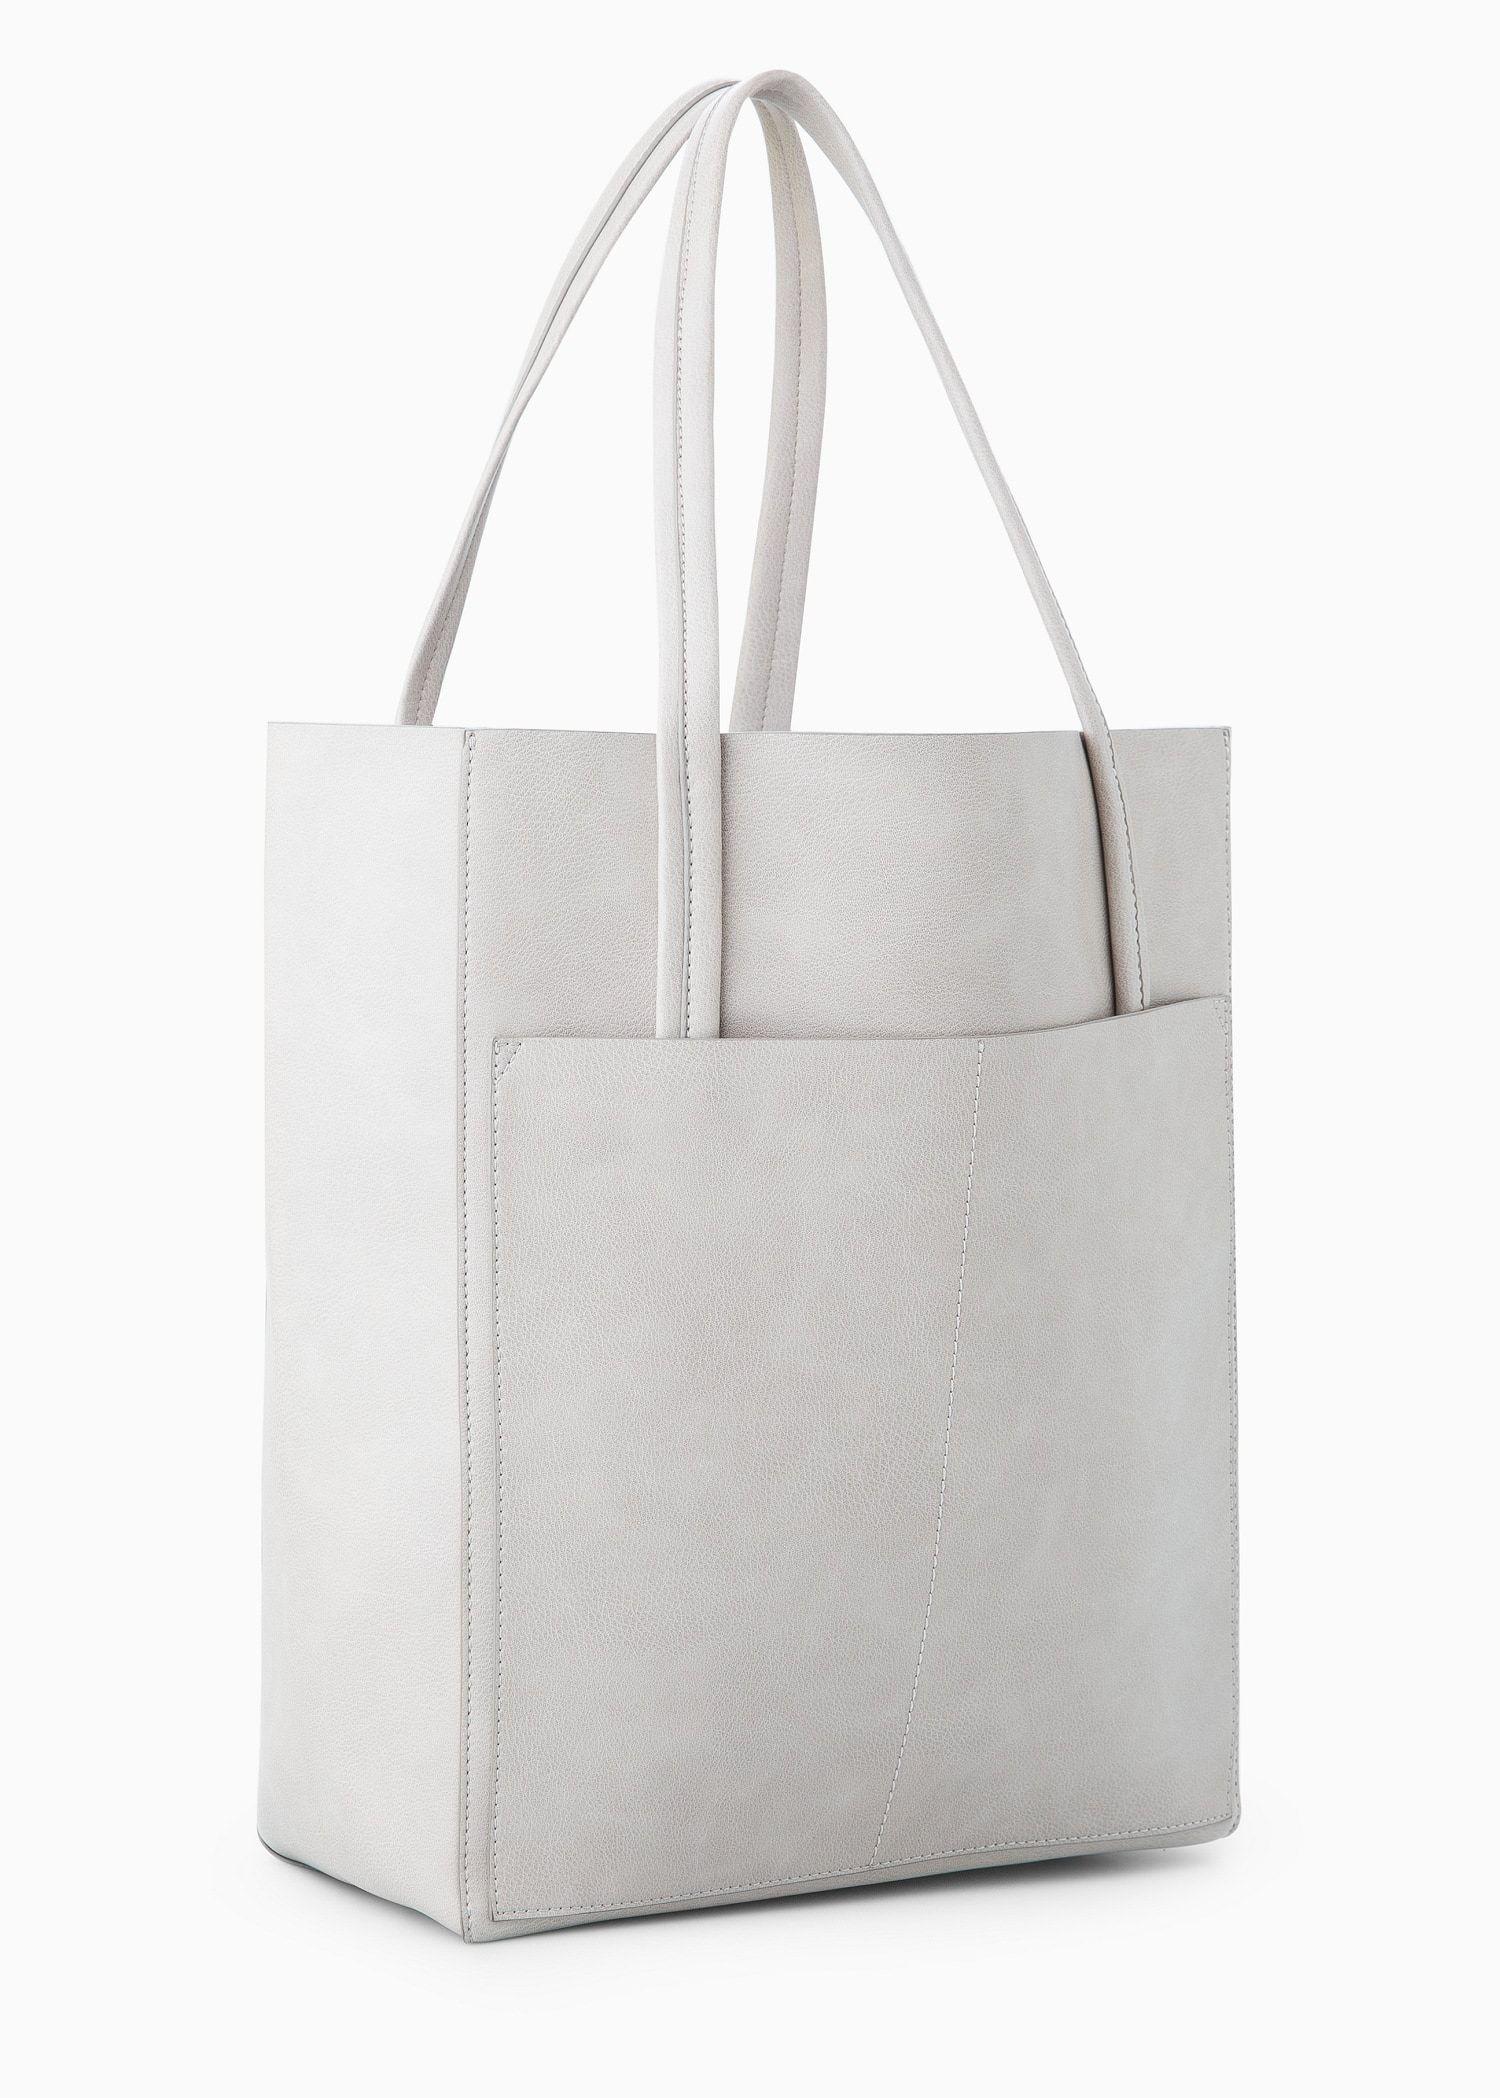 Bolso Shopper Bolsillo Mujer Mango España Shopper Tasche Taschen Lederbrieftaschen